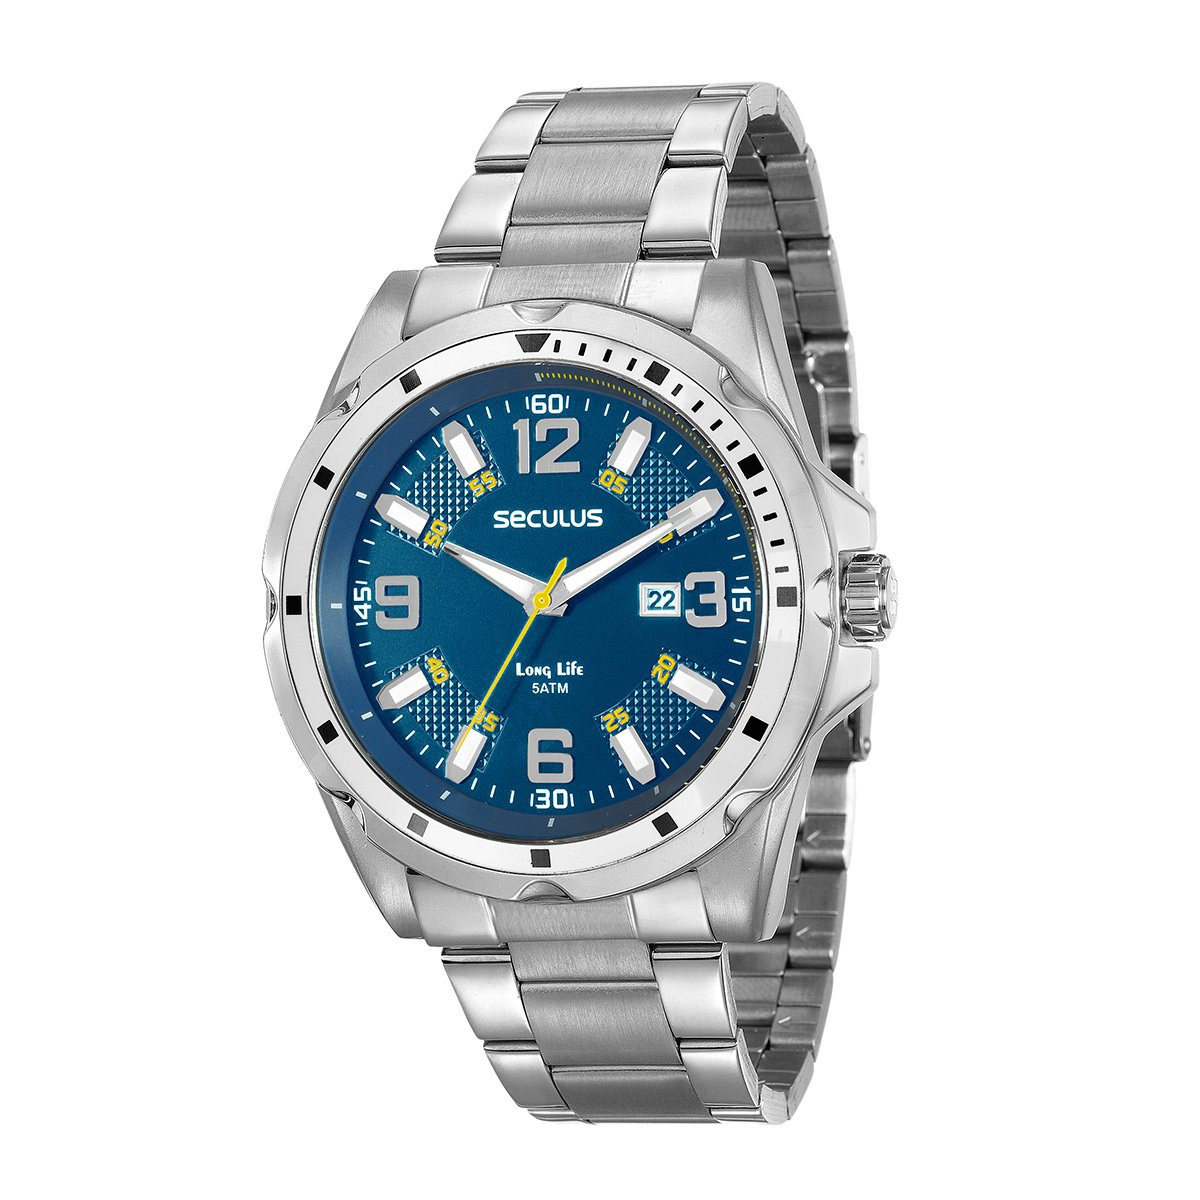 84aa85dc1 Relógio Seculus Analógico 20575G0SVNA2 Masculino - Compre Agora ...